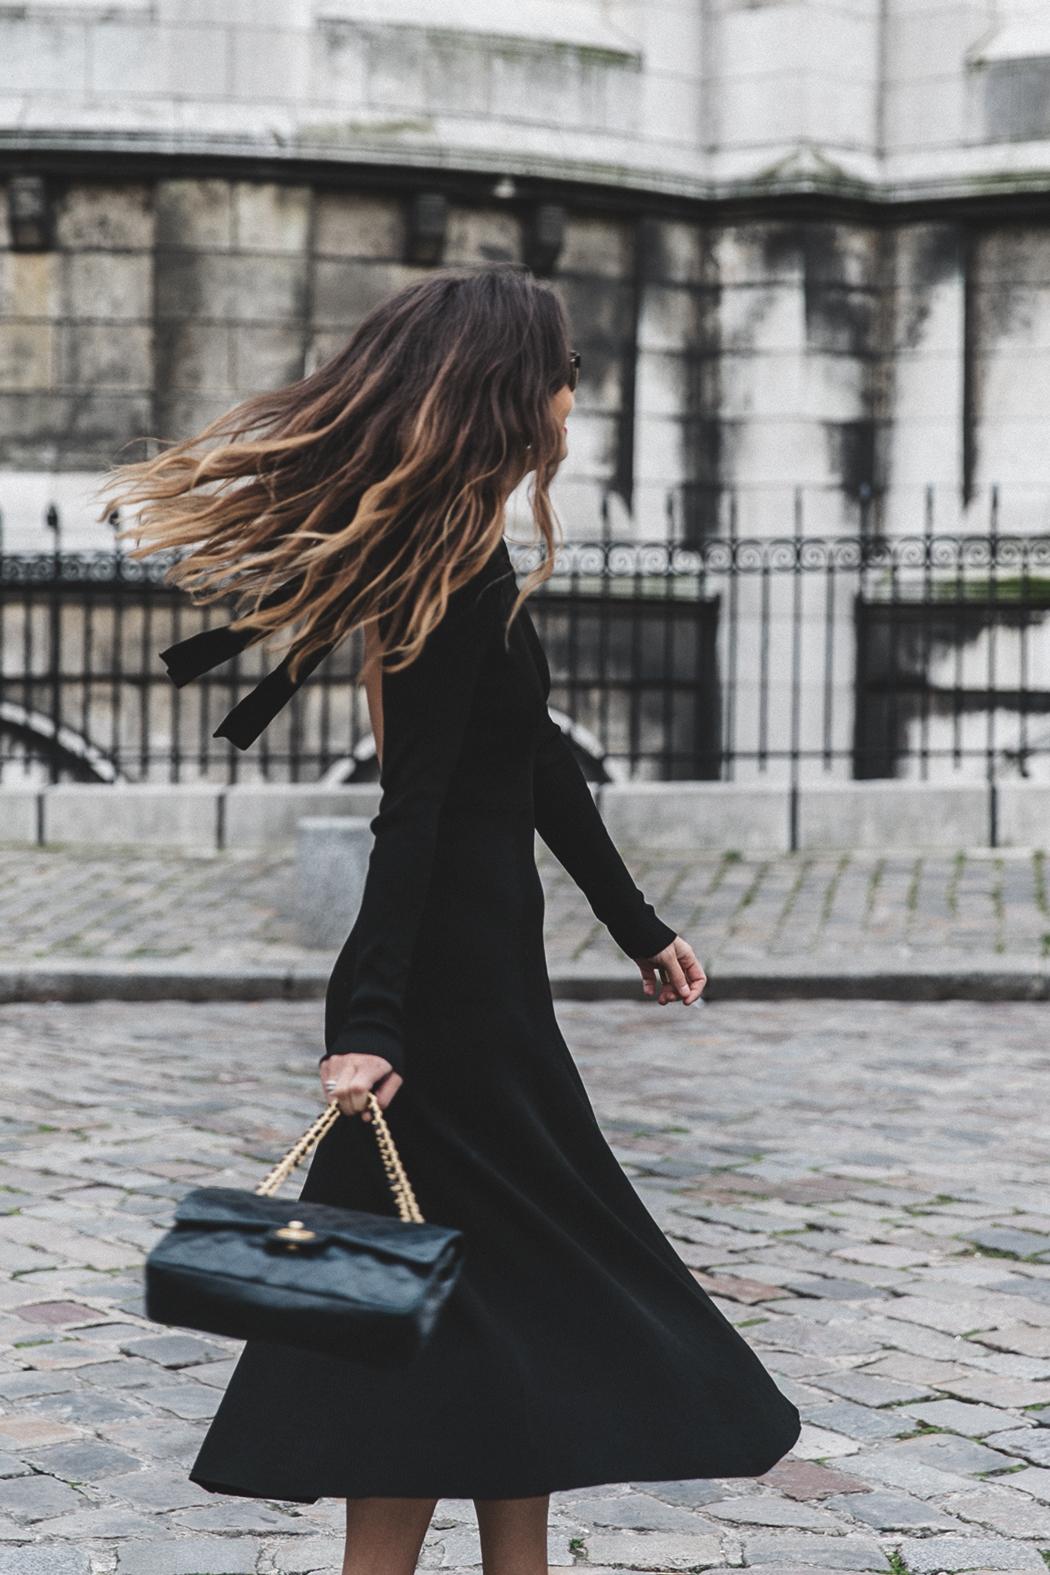 Backless_Dress-Black_Dress-Chanel_Shoes-Paris-PFW-Paris_Fashion_Week_Fall_2016-51